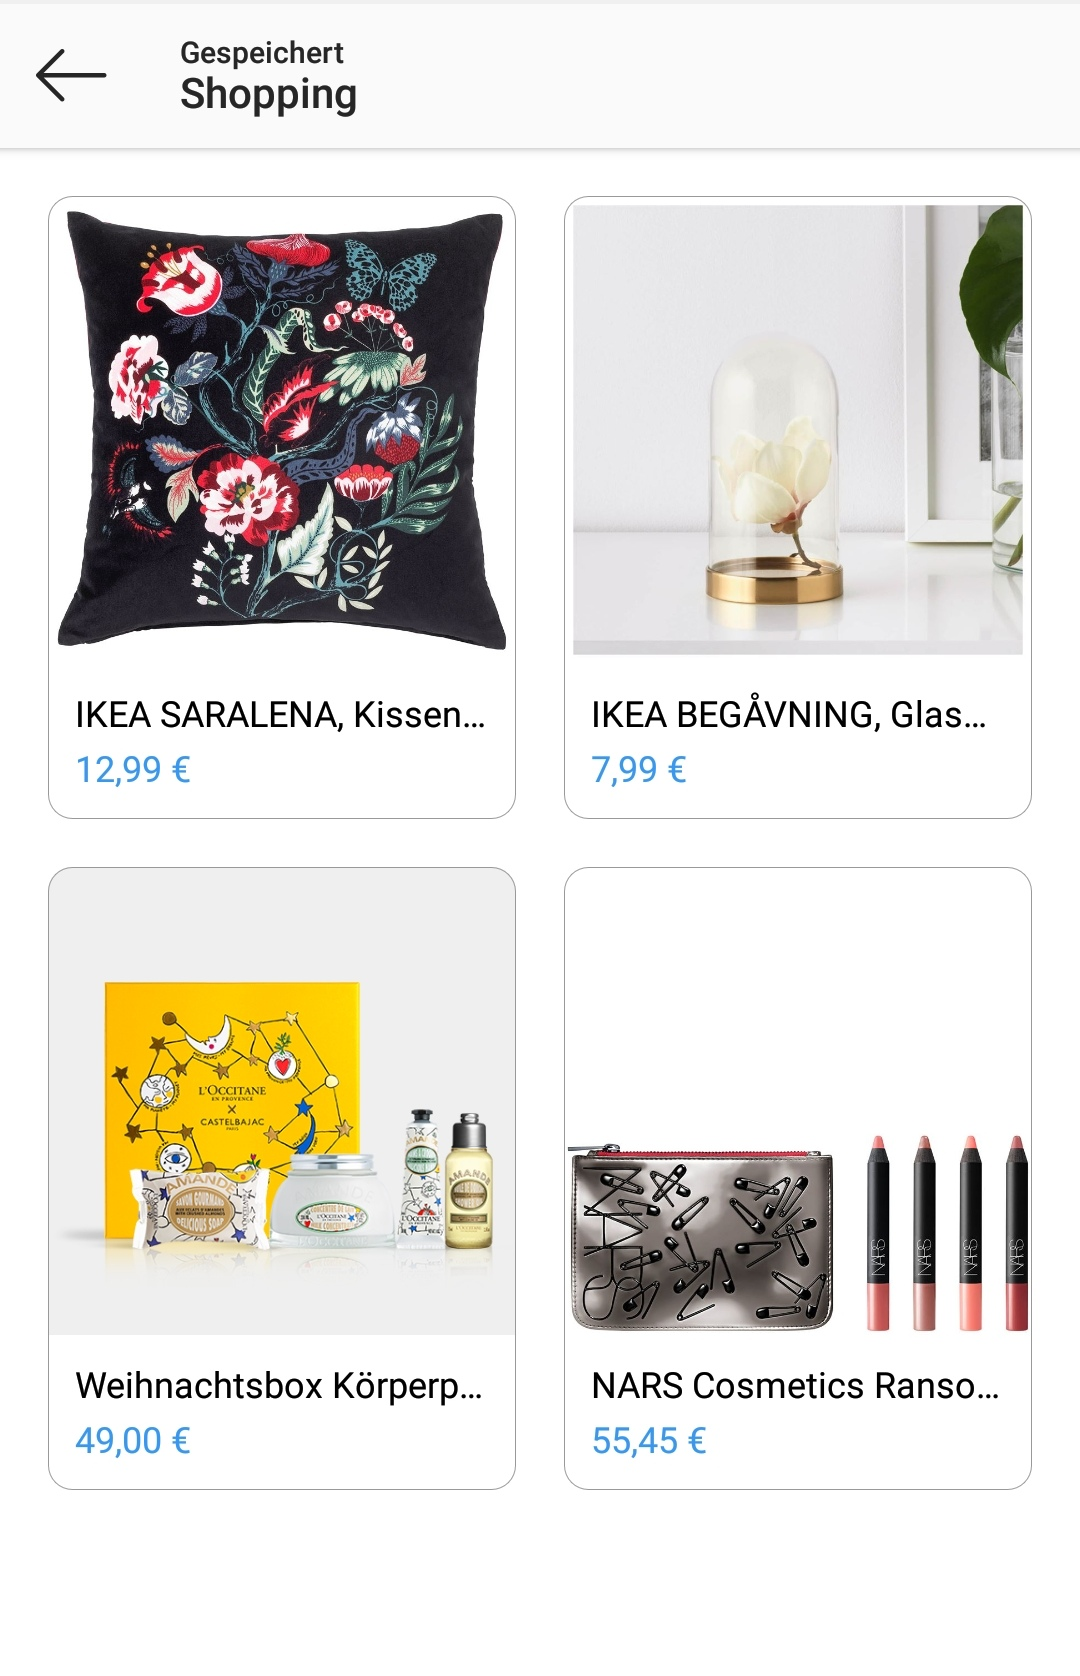 Gespeicherte Shopping Produkte Instagram